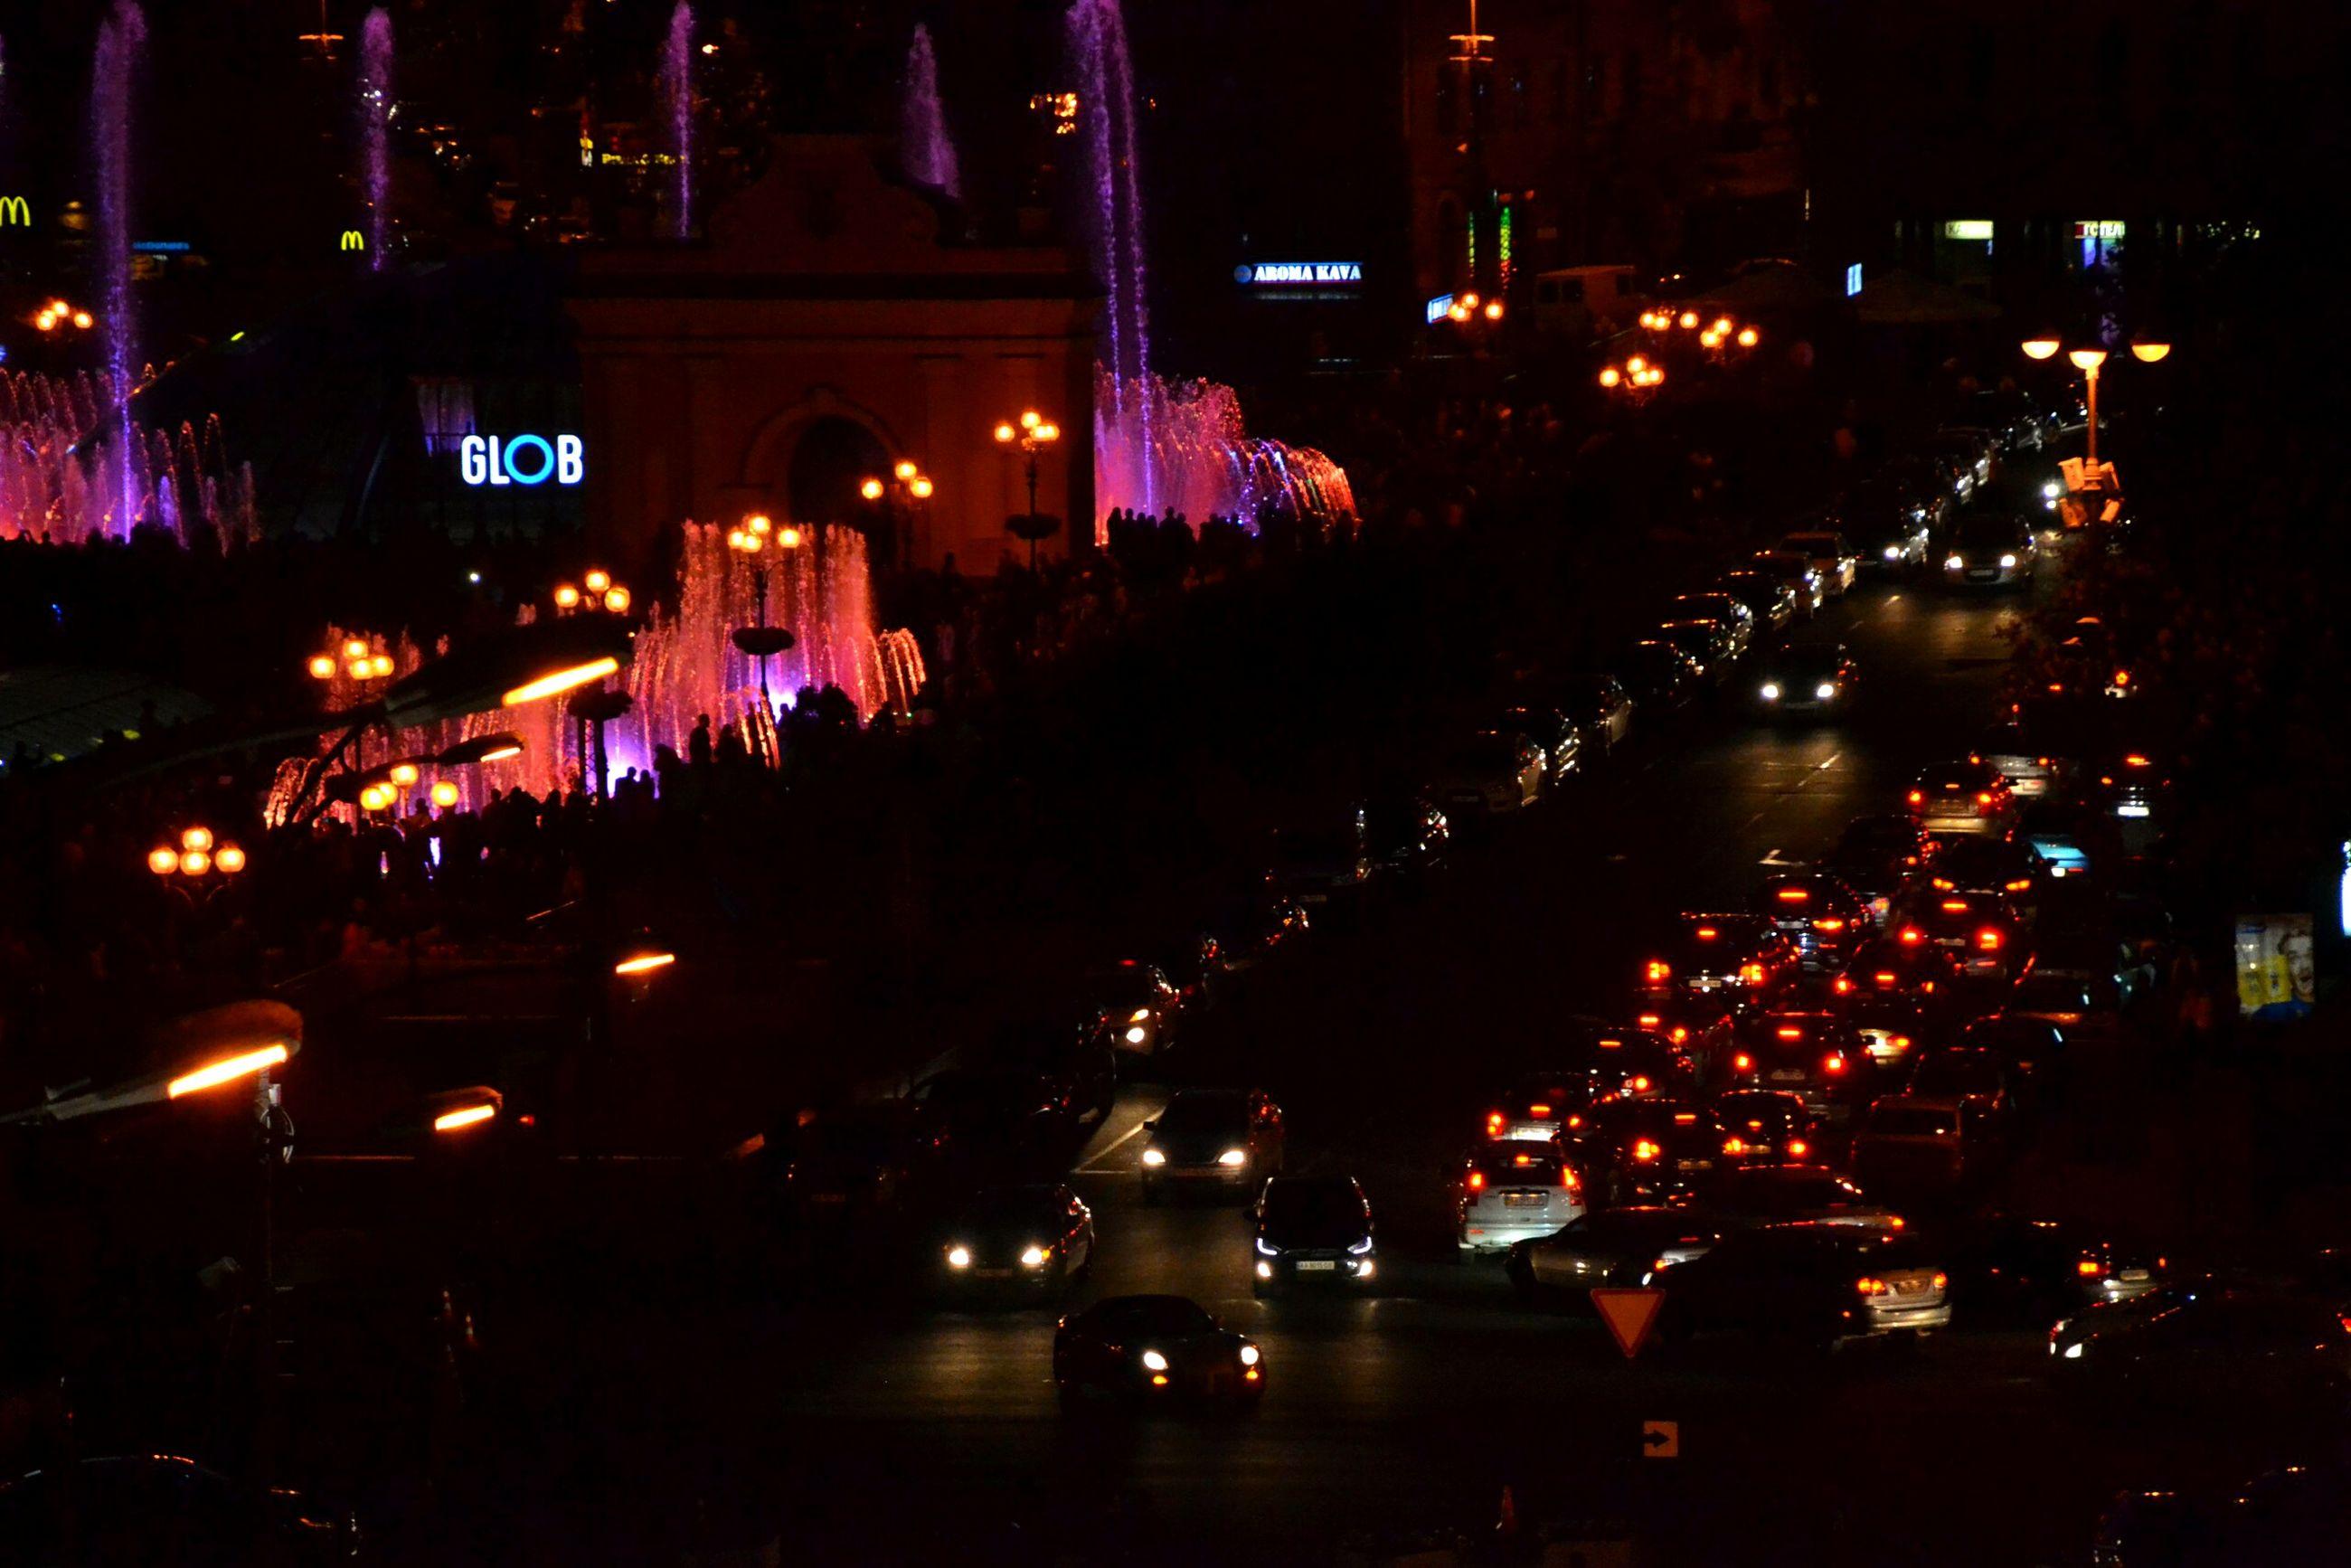 illuminated, night, land vehicle, car, city, large group of people, outdoors, architecture, people